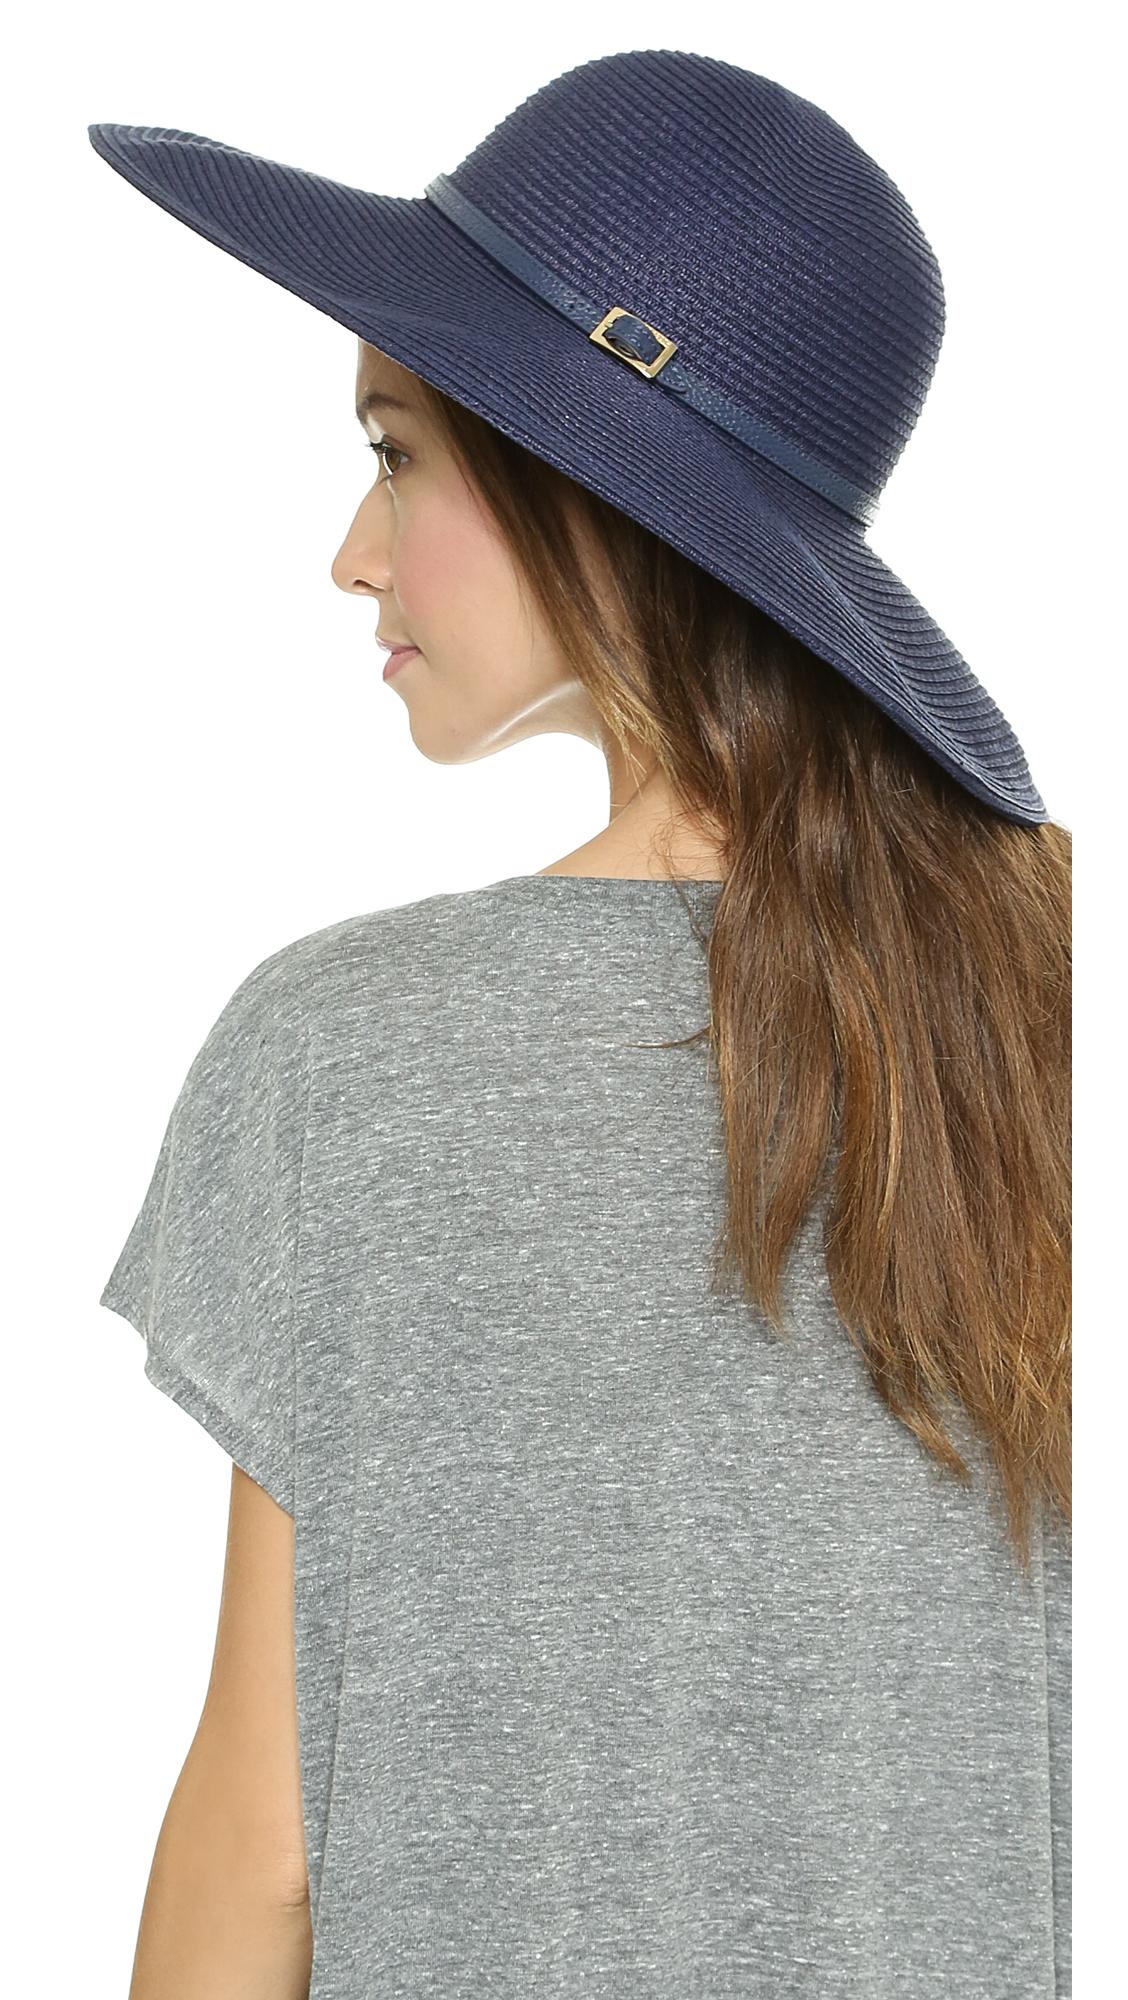 Lyst - Melissa Odabash Jemima Sun Hat - Navy in Blue b87329f03e4